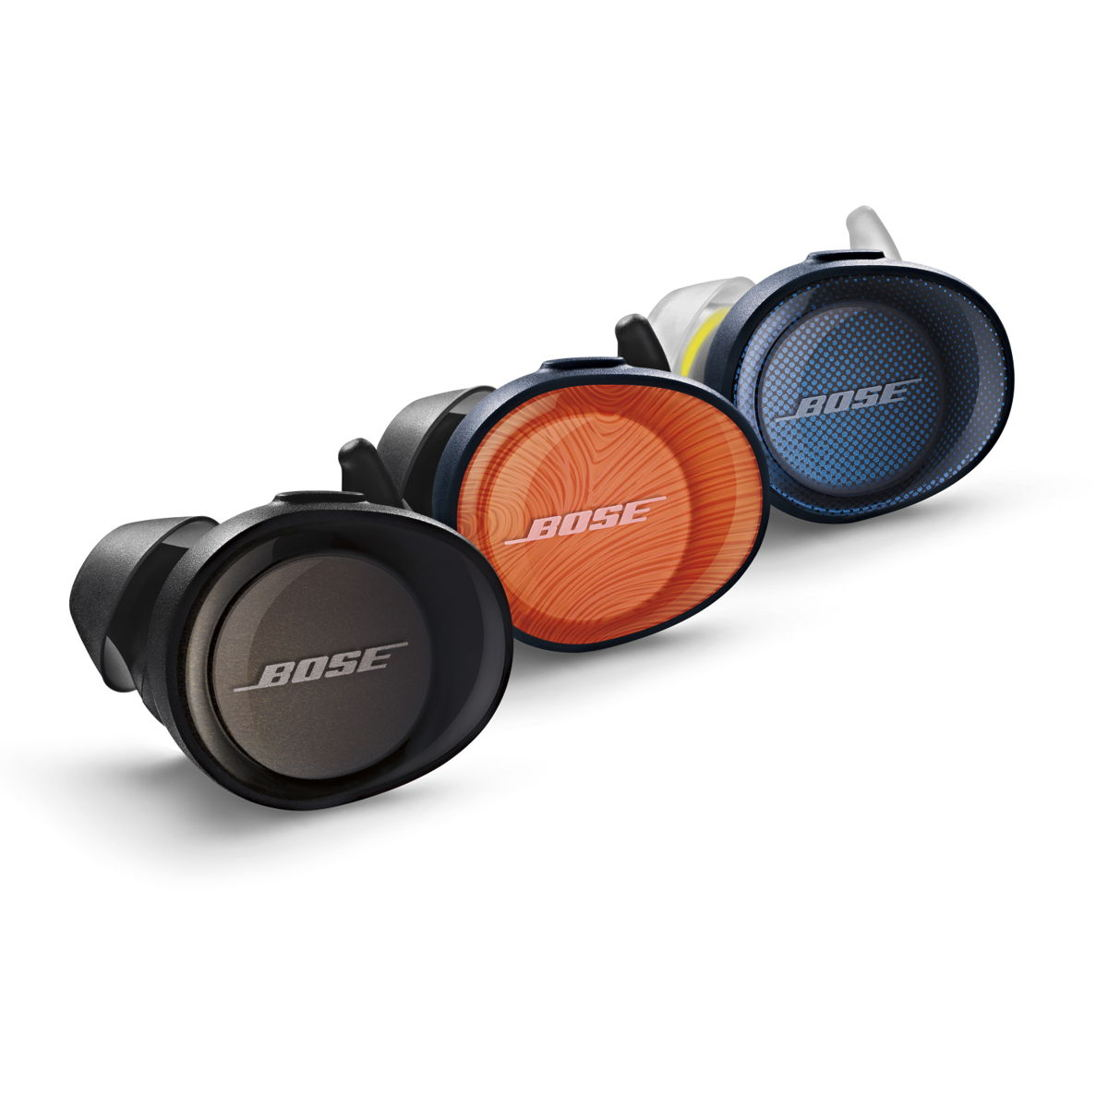 Bose SoundSport Free hoofdtelefoon: €199,95